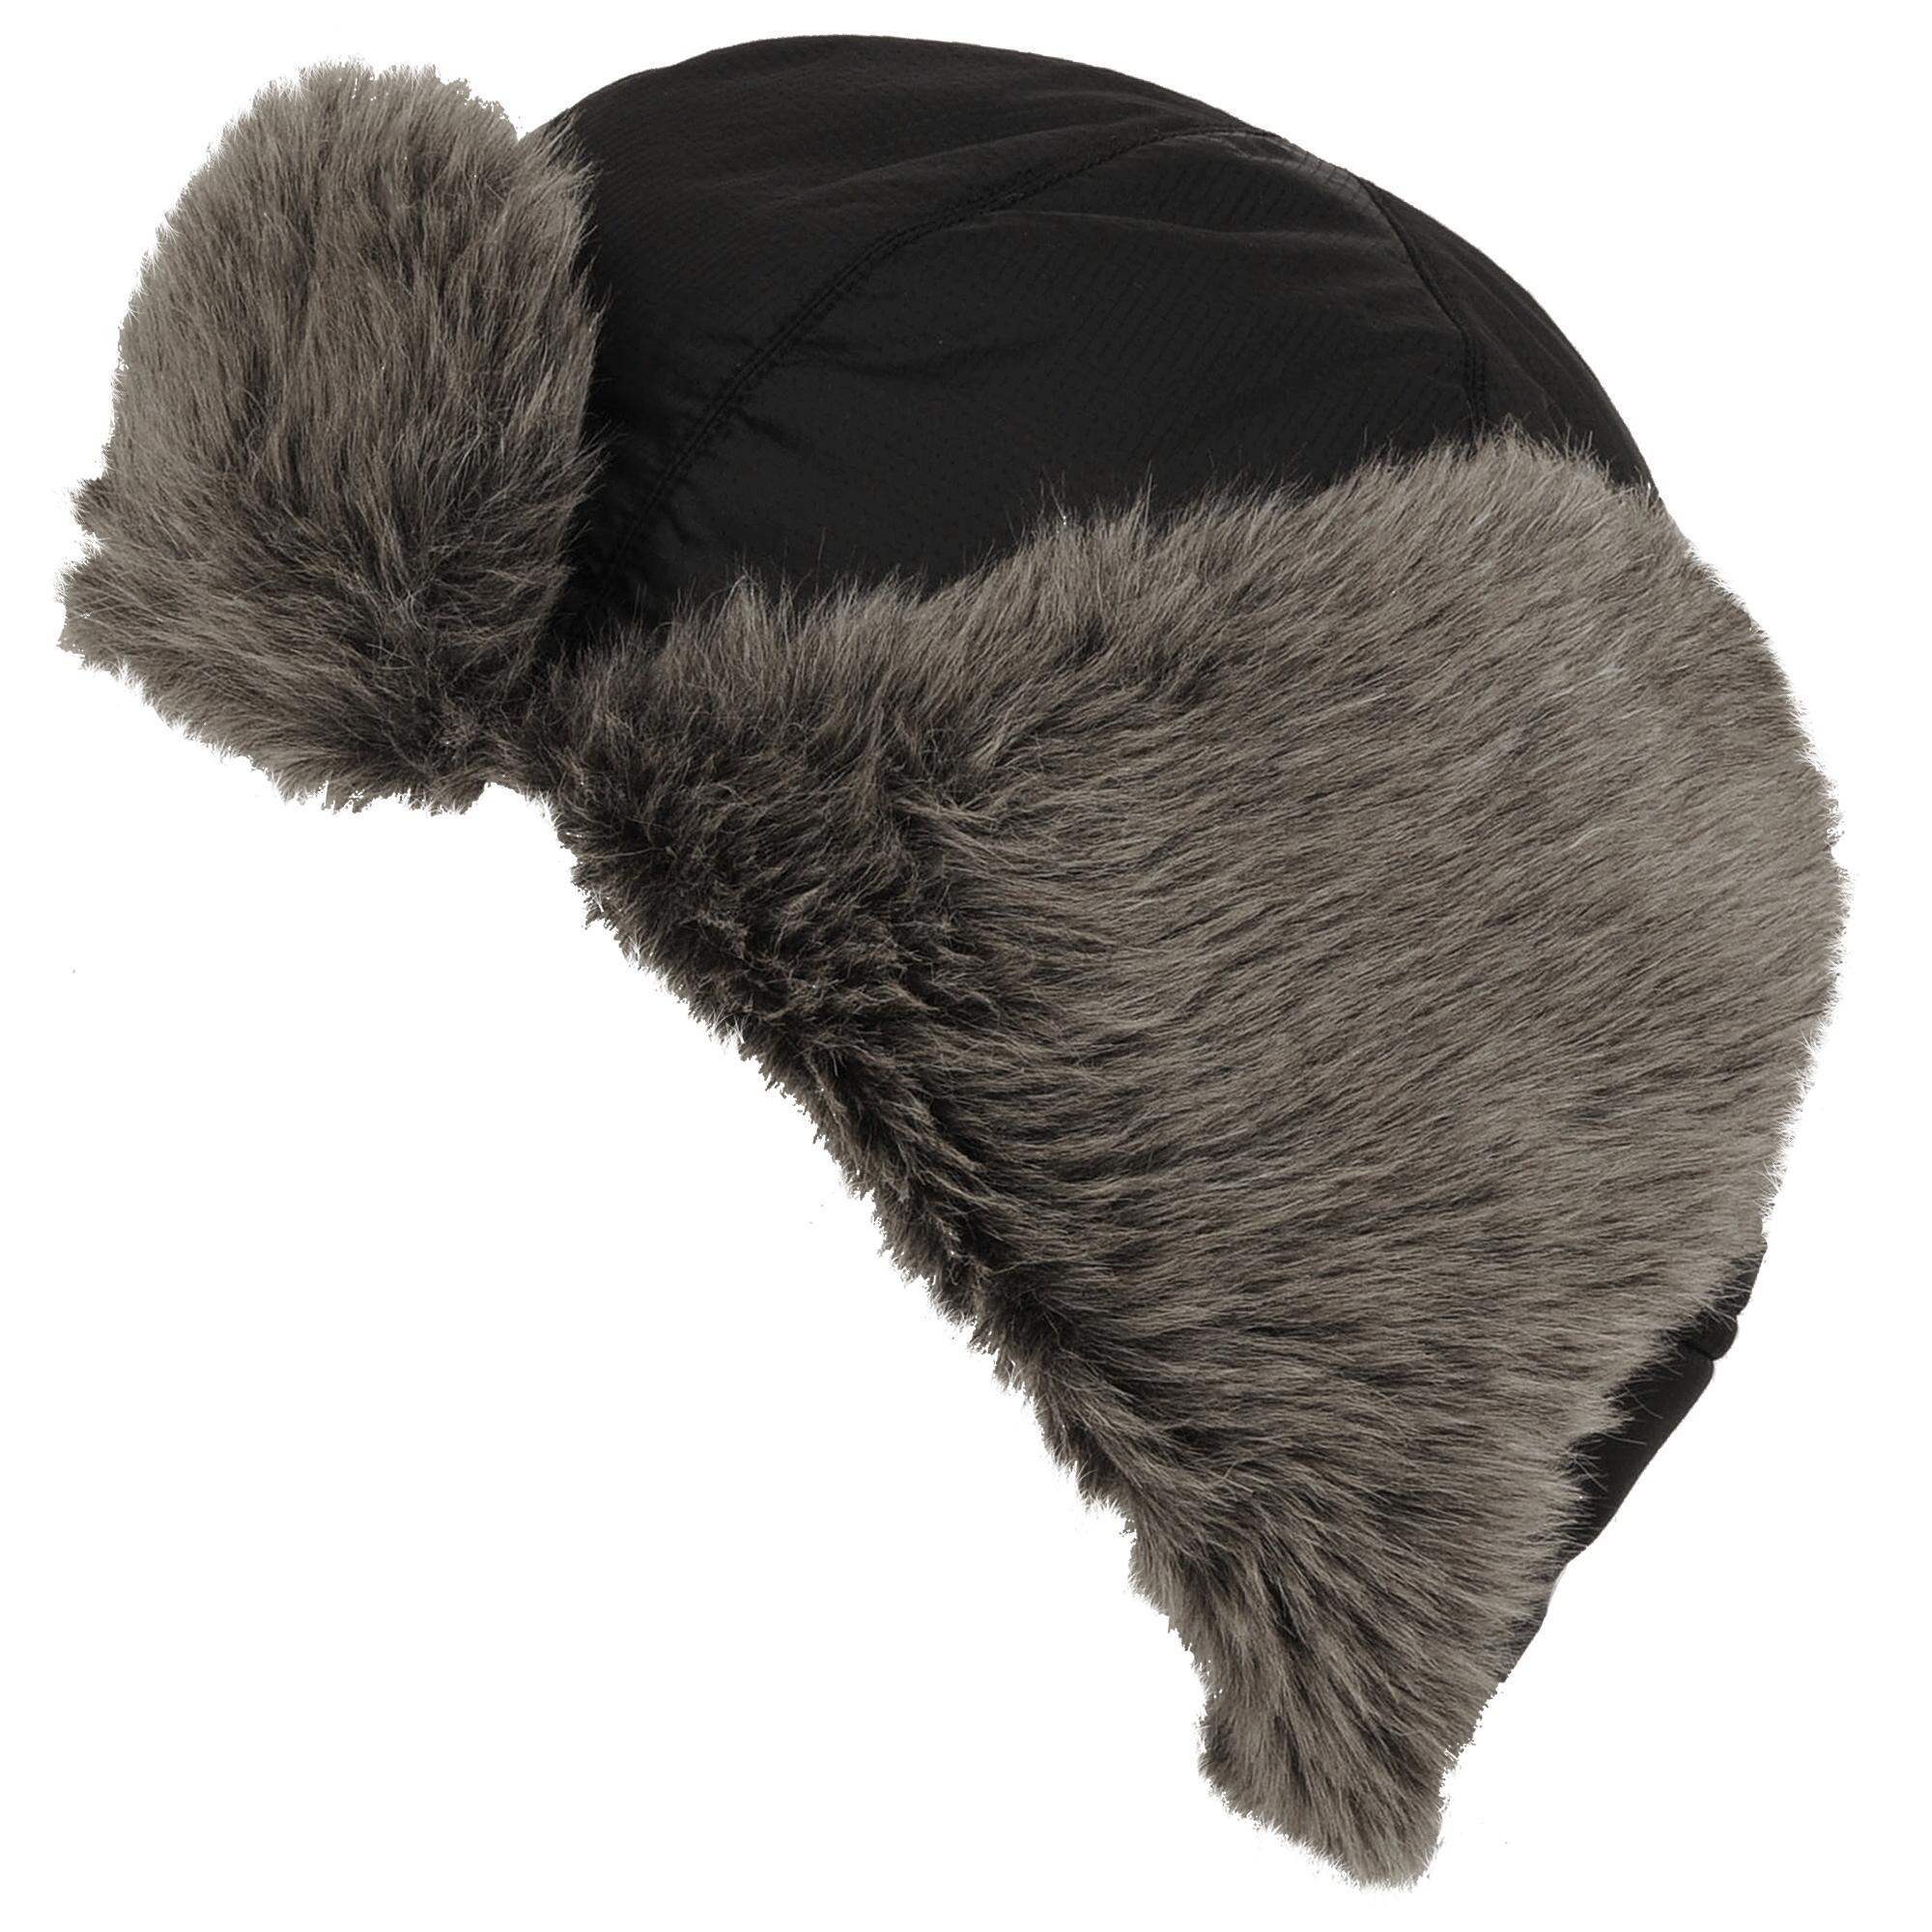 00177a559bdec Wilsons Leather - Black Ripstop Nylon Trapper Hat W  Faux-fur for Men -.  View fullscreen